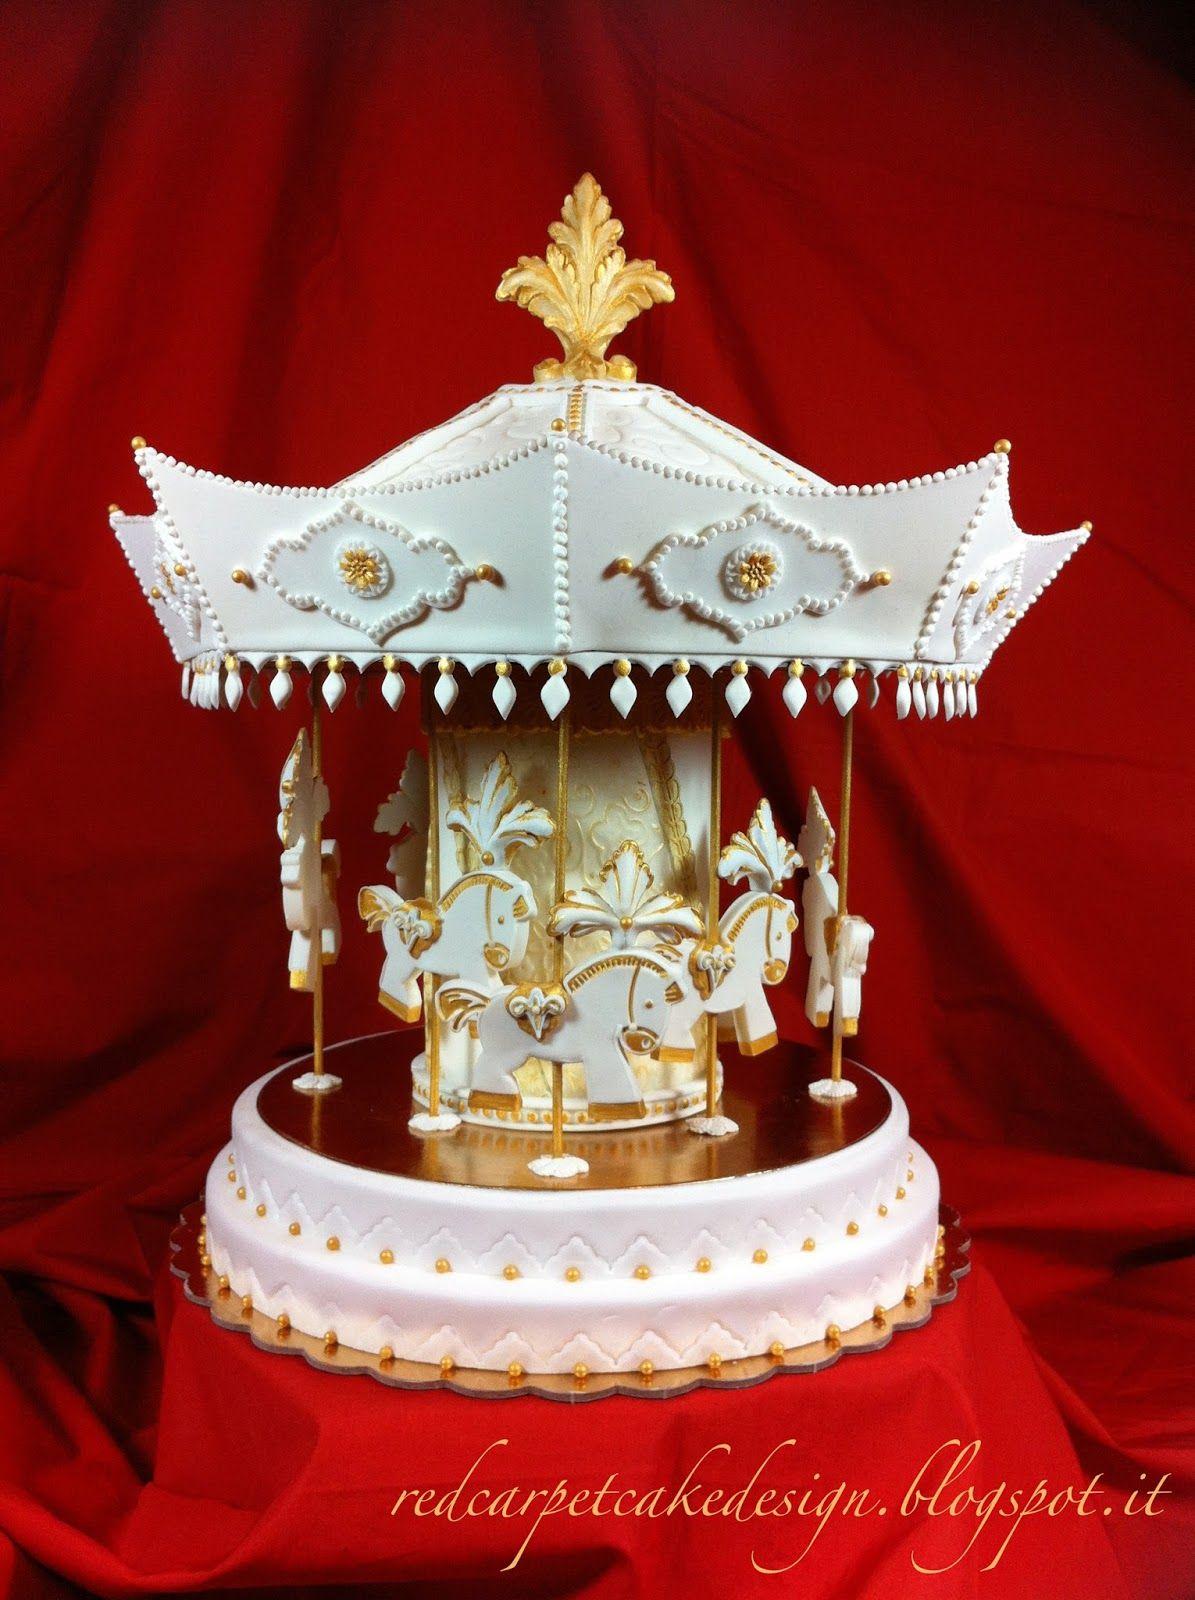 CAROUSEL CAKE- pubblicato in Cucina Chic Cake Design n°20/21 ...